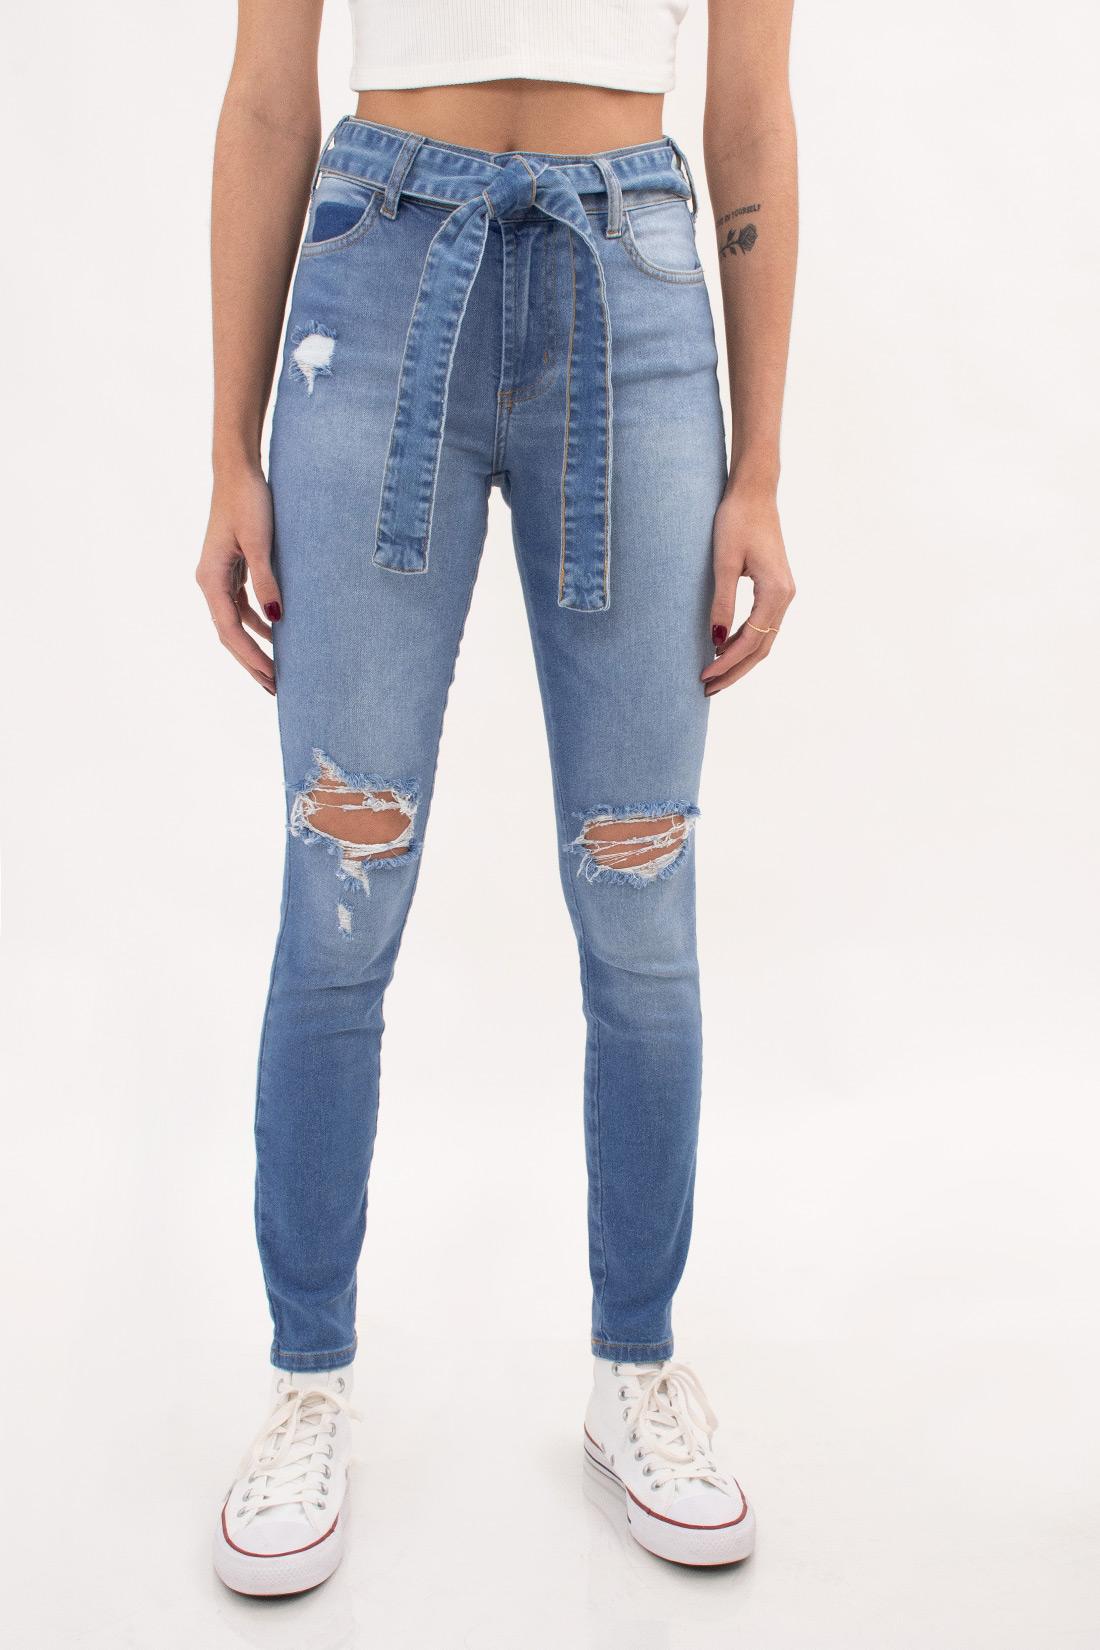 Calca Jeans Colcci Bia Com Cinto